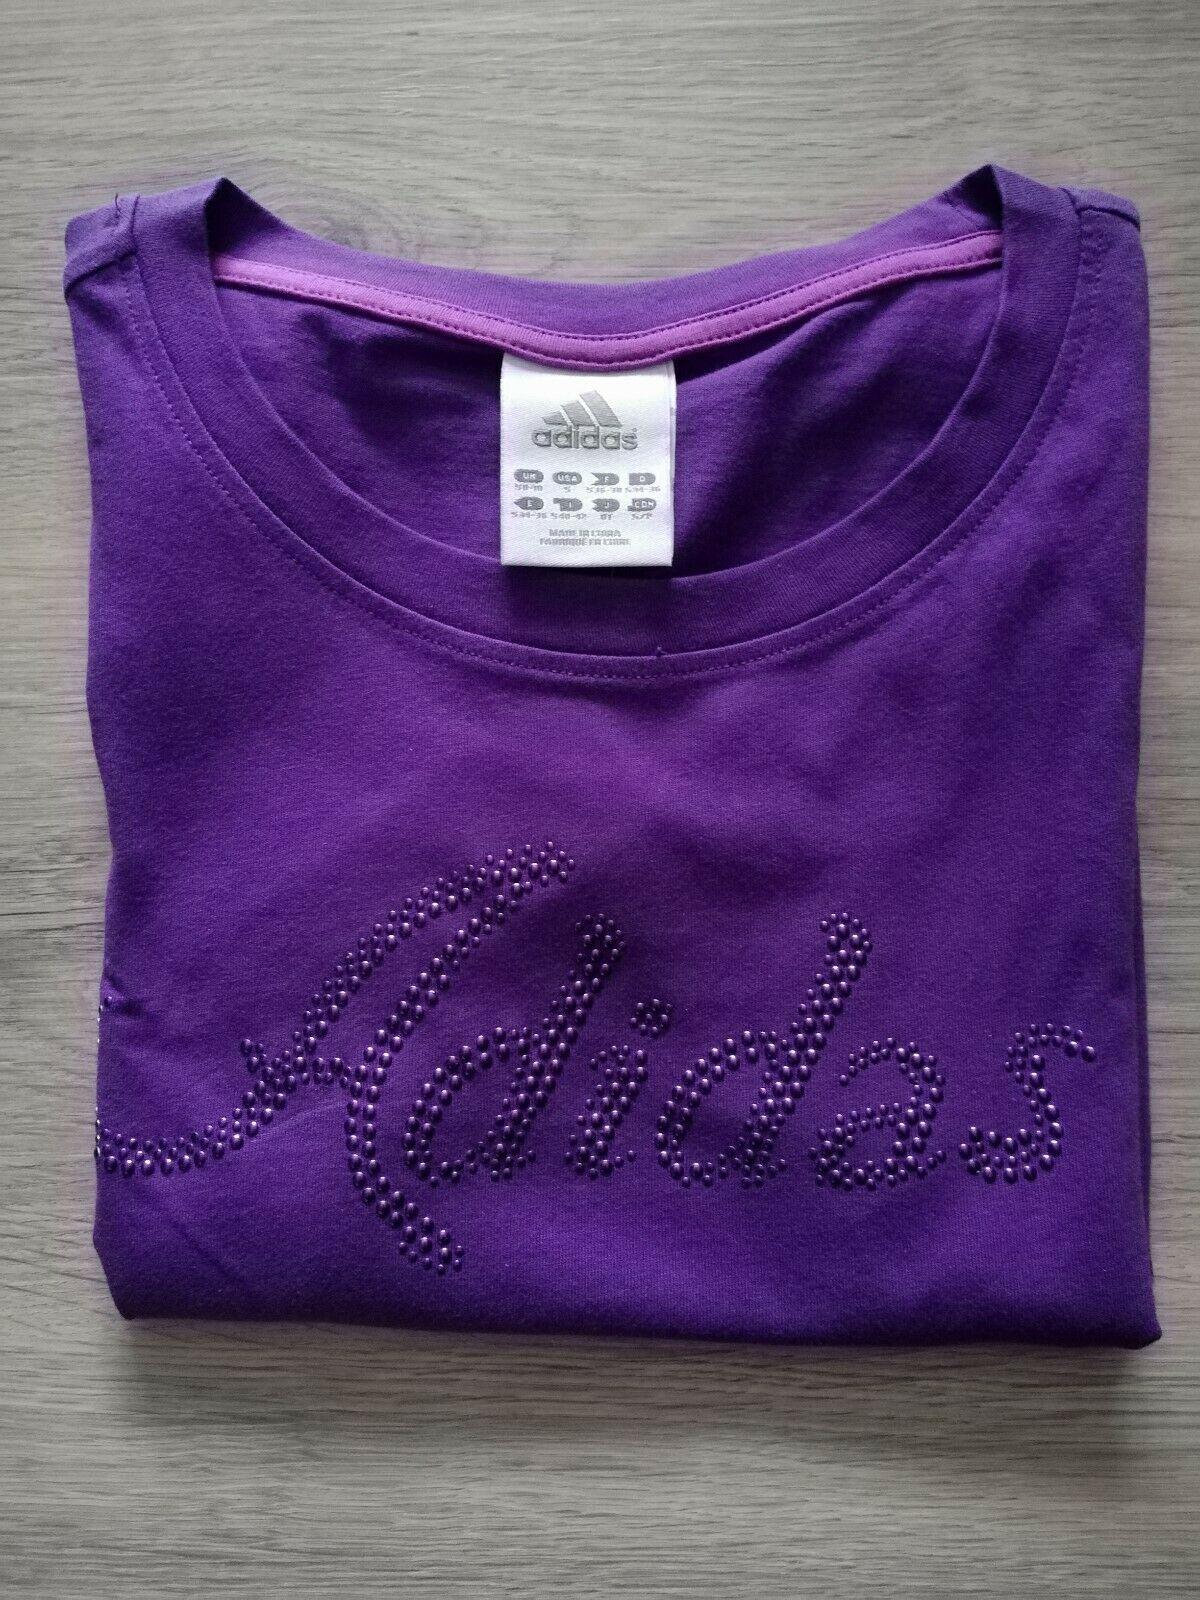 Adidas T Shirts Tops Set Damen blau lila hellblau Shirt Top Frauen Sport NEU!